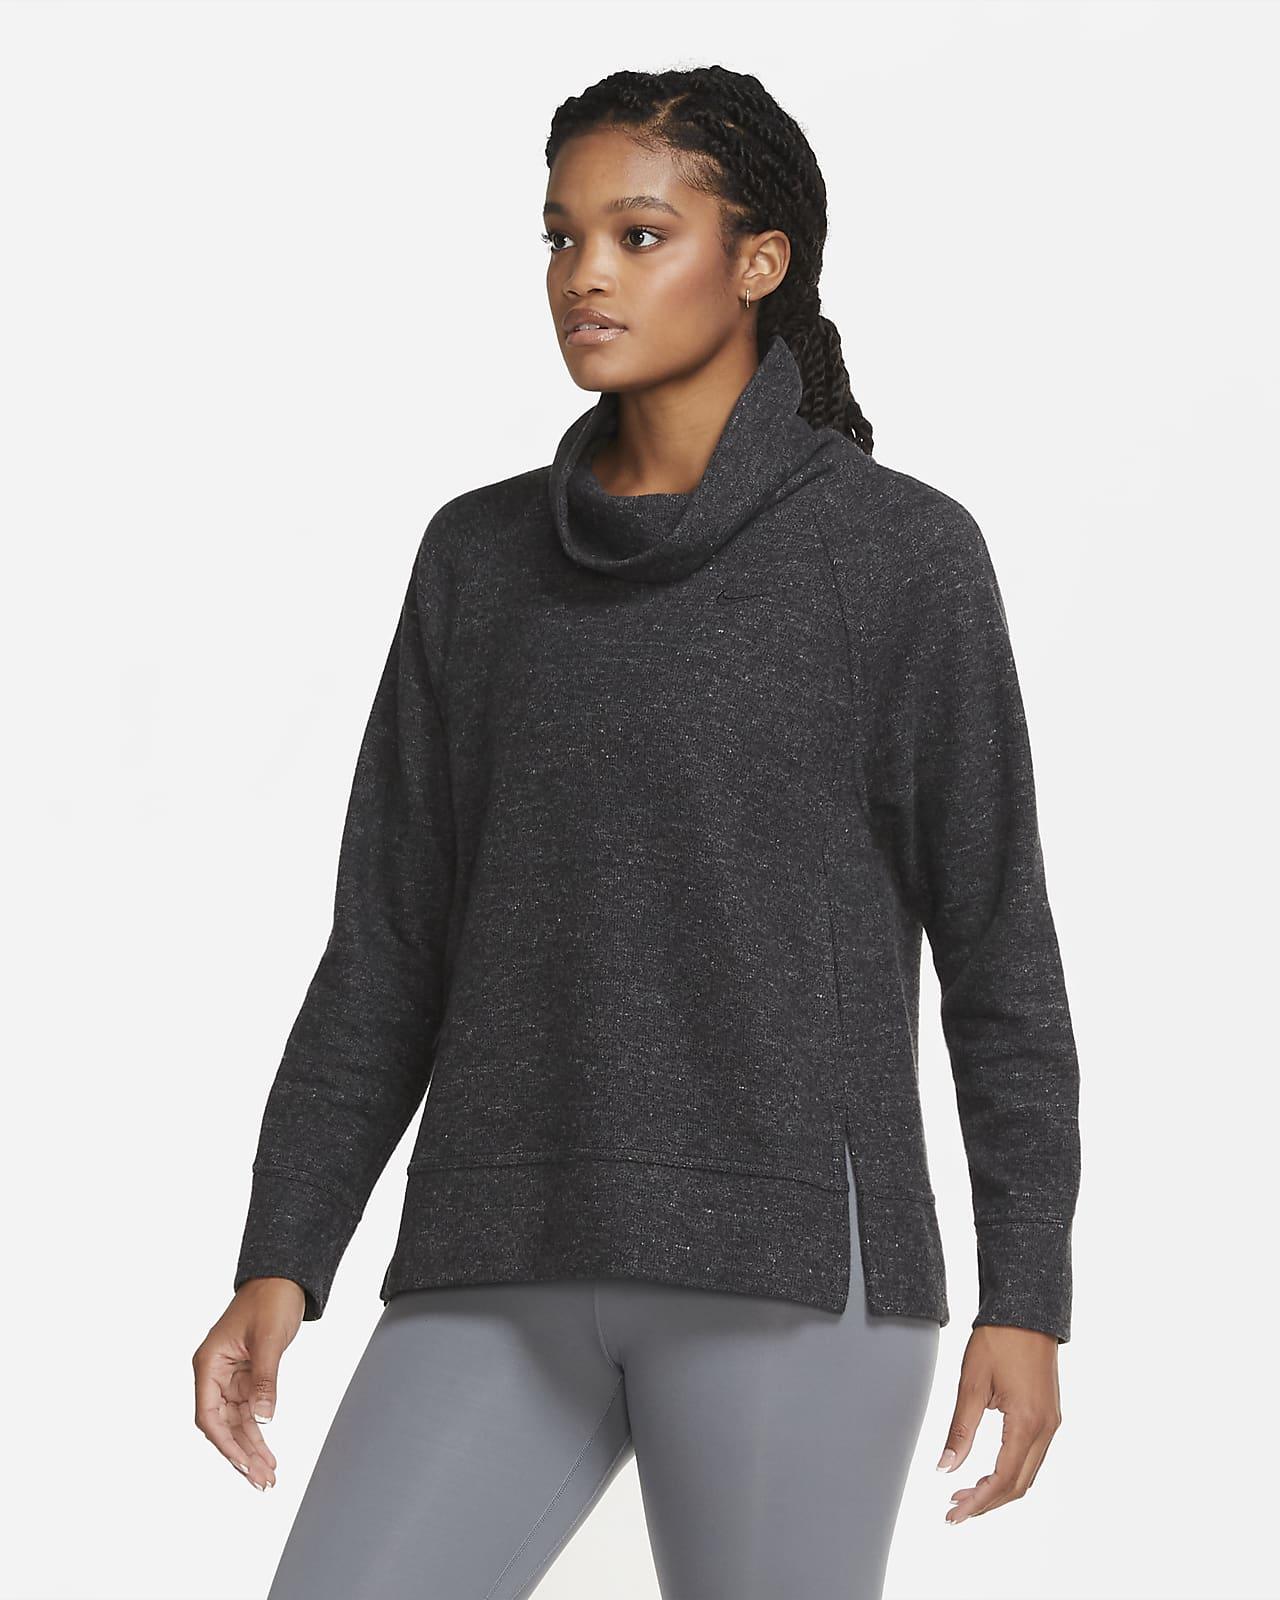 Nike Therma Women's Fleece Training Top